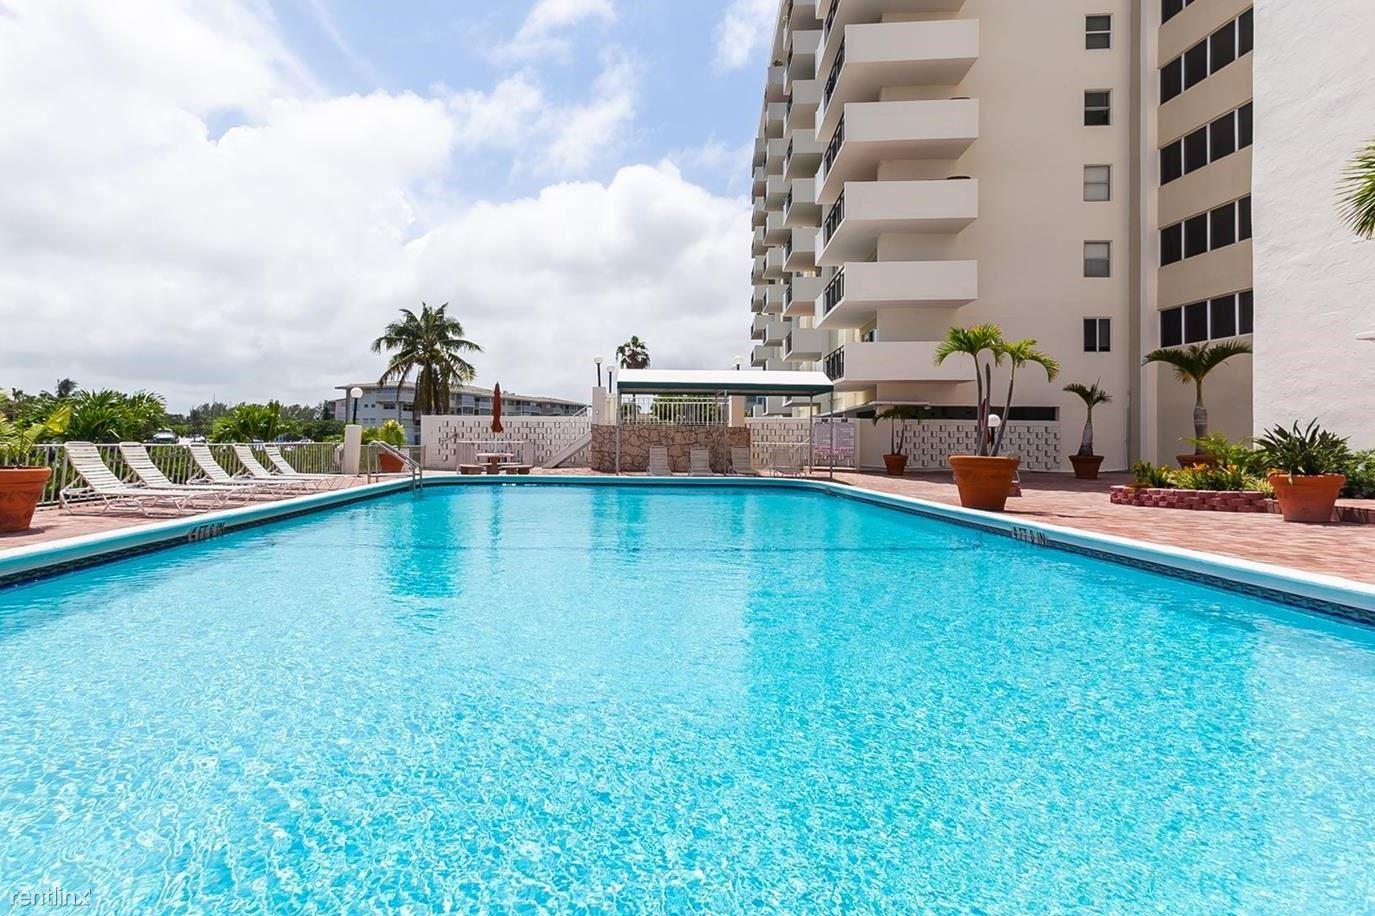 401 Golden Isles Dr Apt 741, Hallandale Beach, FL - $1,700